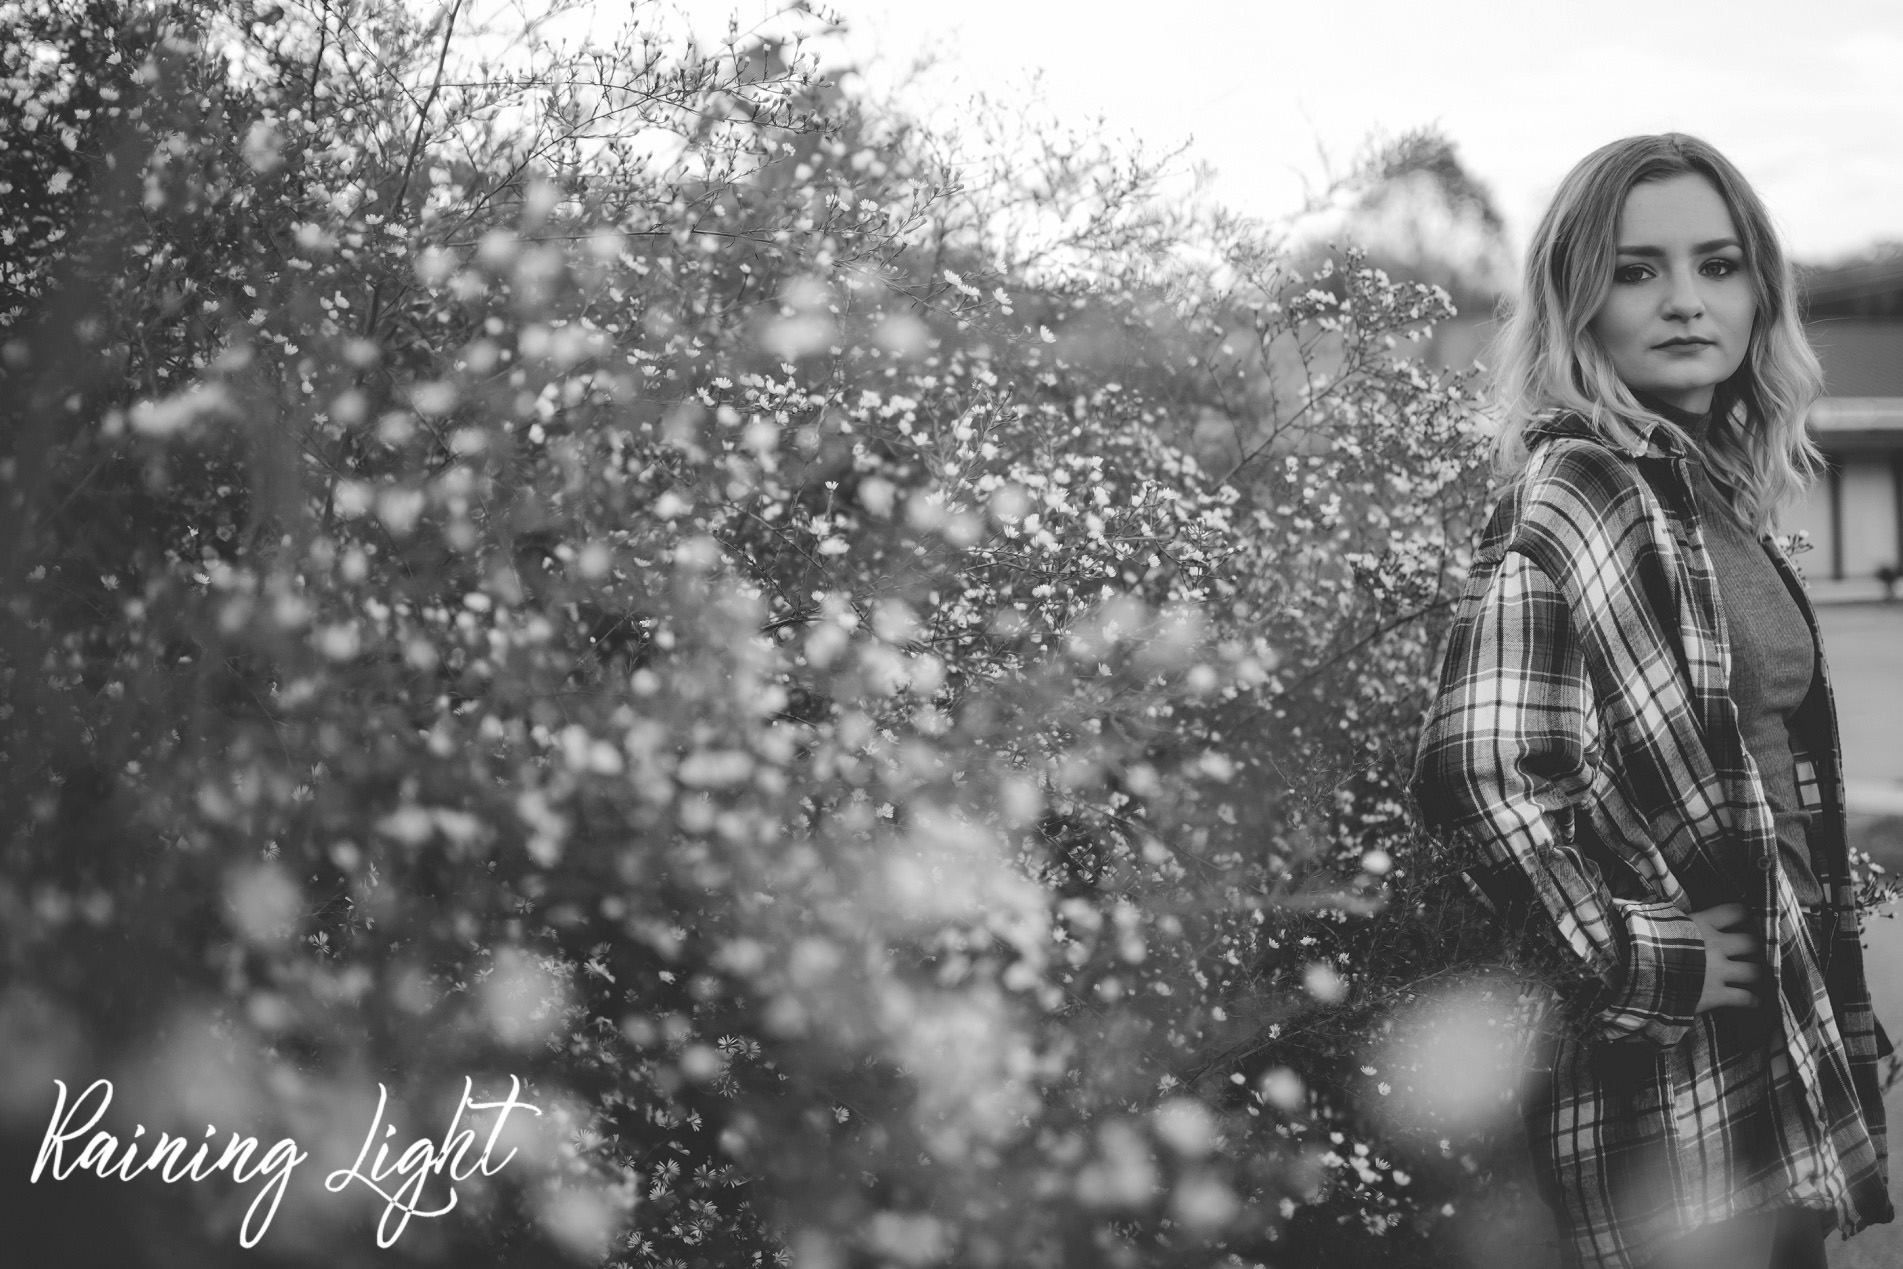 raininglightphotos-Myk-Senior001.jpg